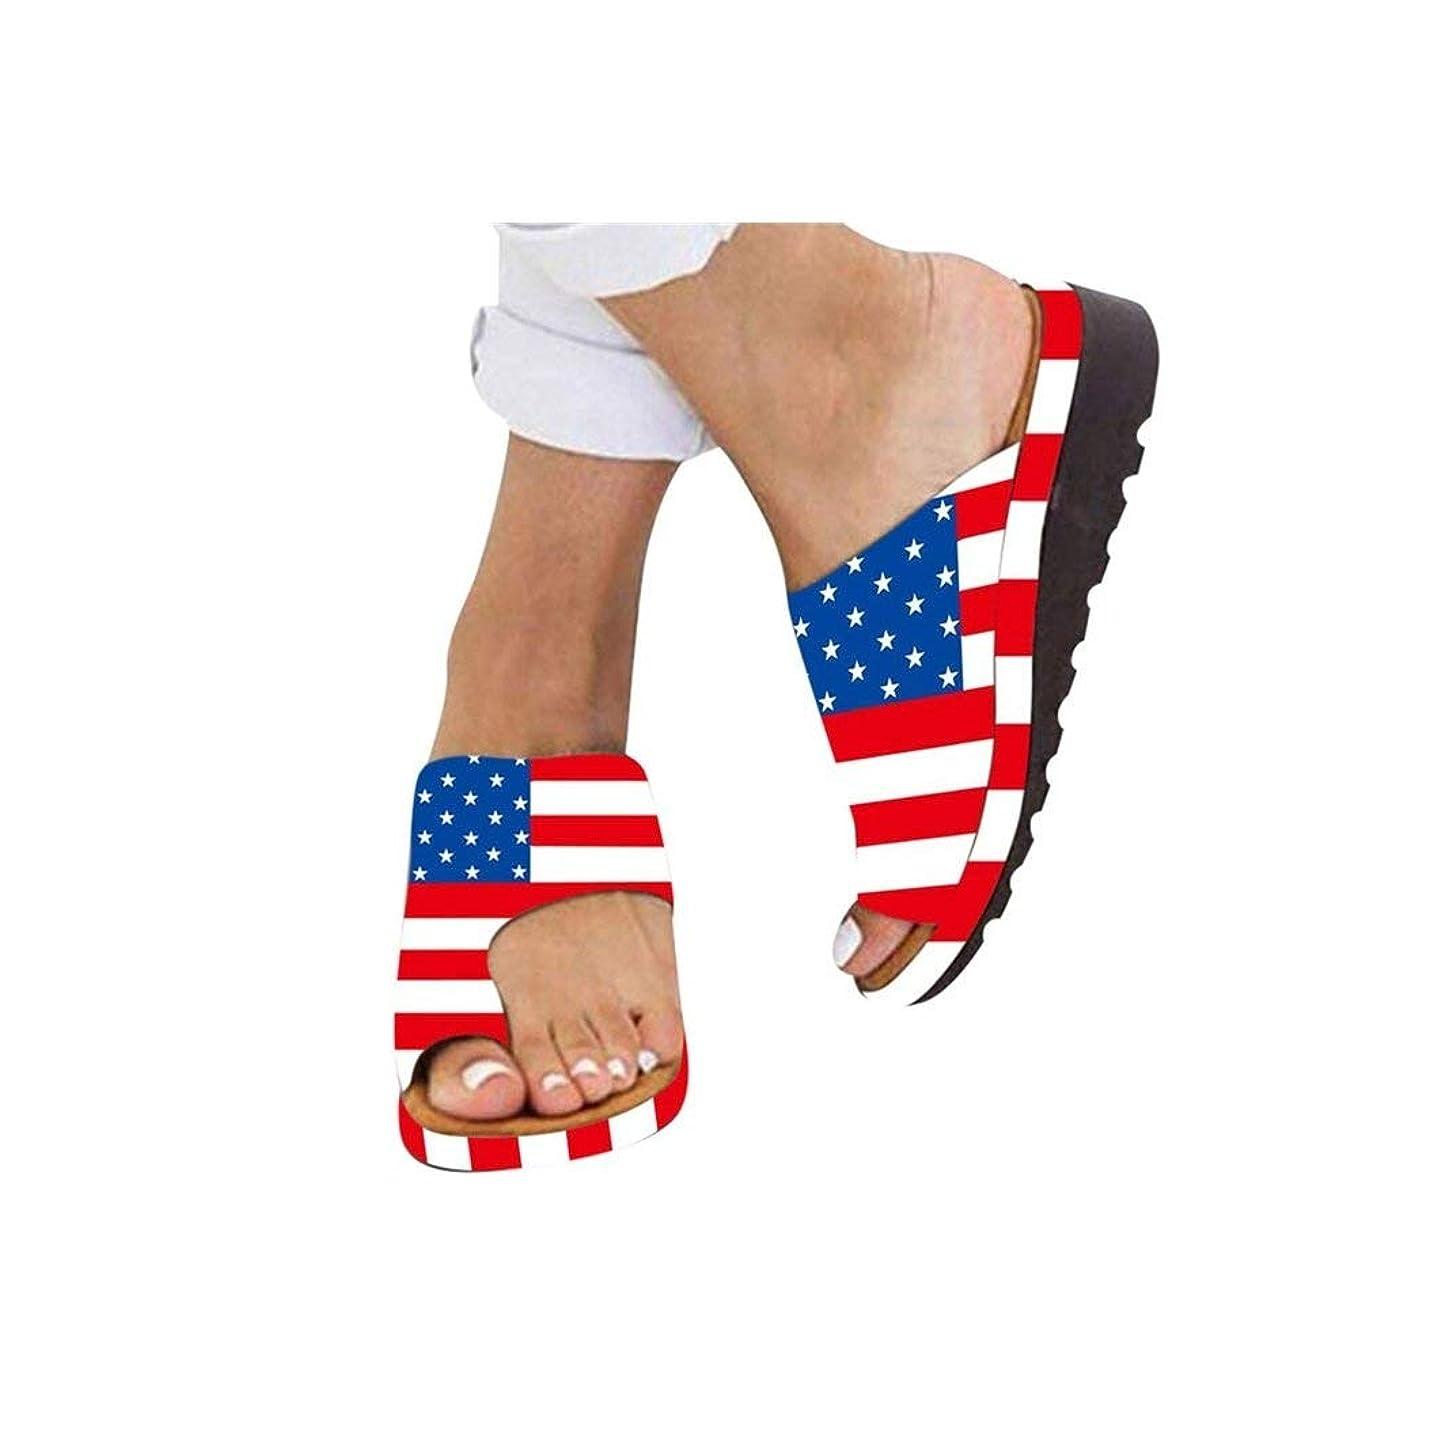 Women's Aditi Low Wedge Dress Sandals Casual Flip Flops Buckle Strap Wedges Sandals Platforms Shoes